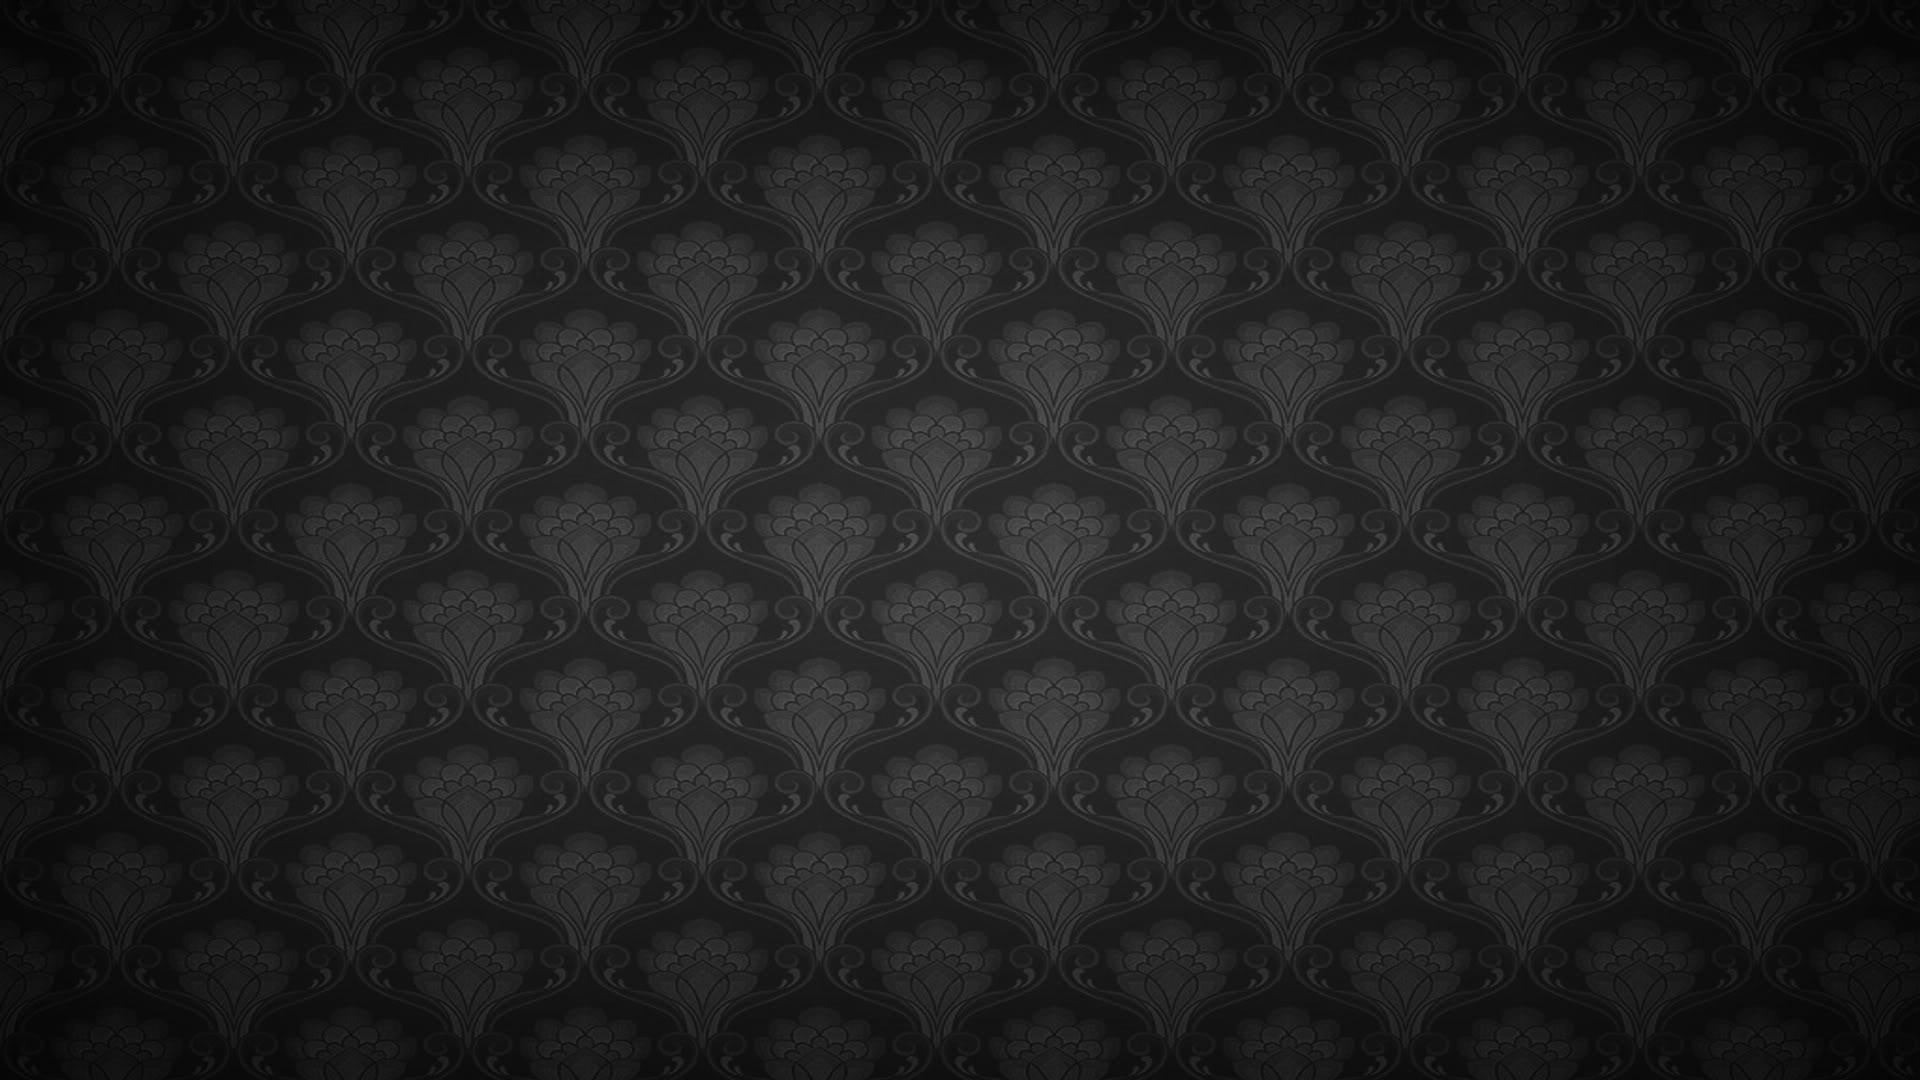 Black Website Background Wallpaper   MixHD wallpapers 1920x1080